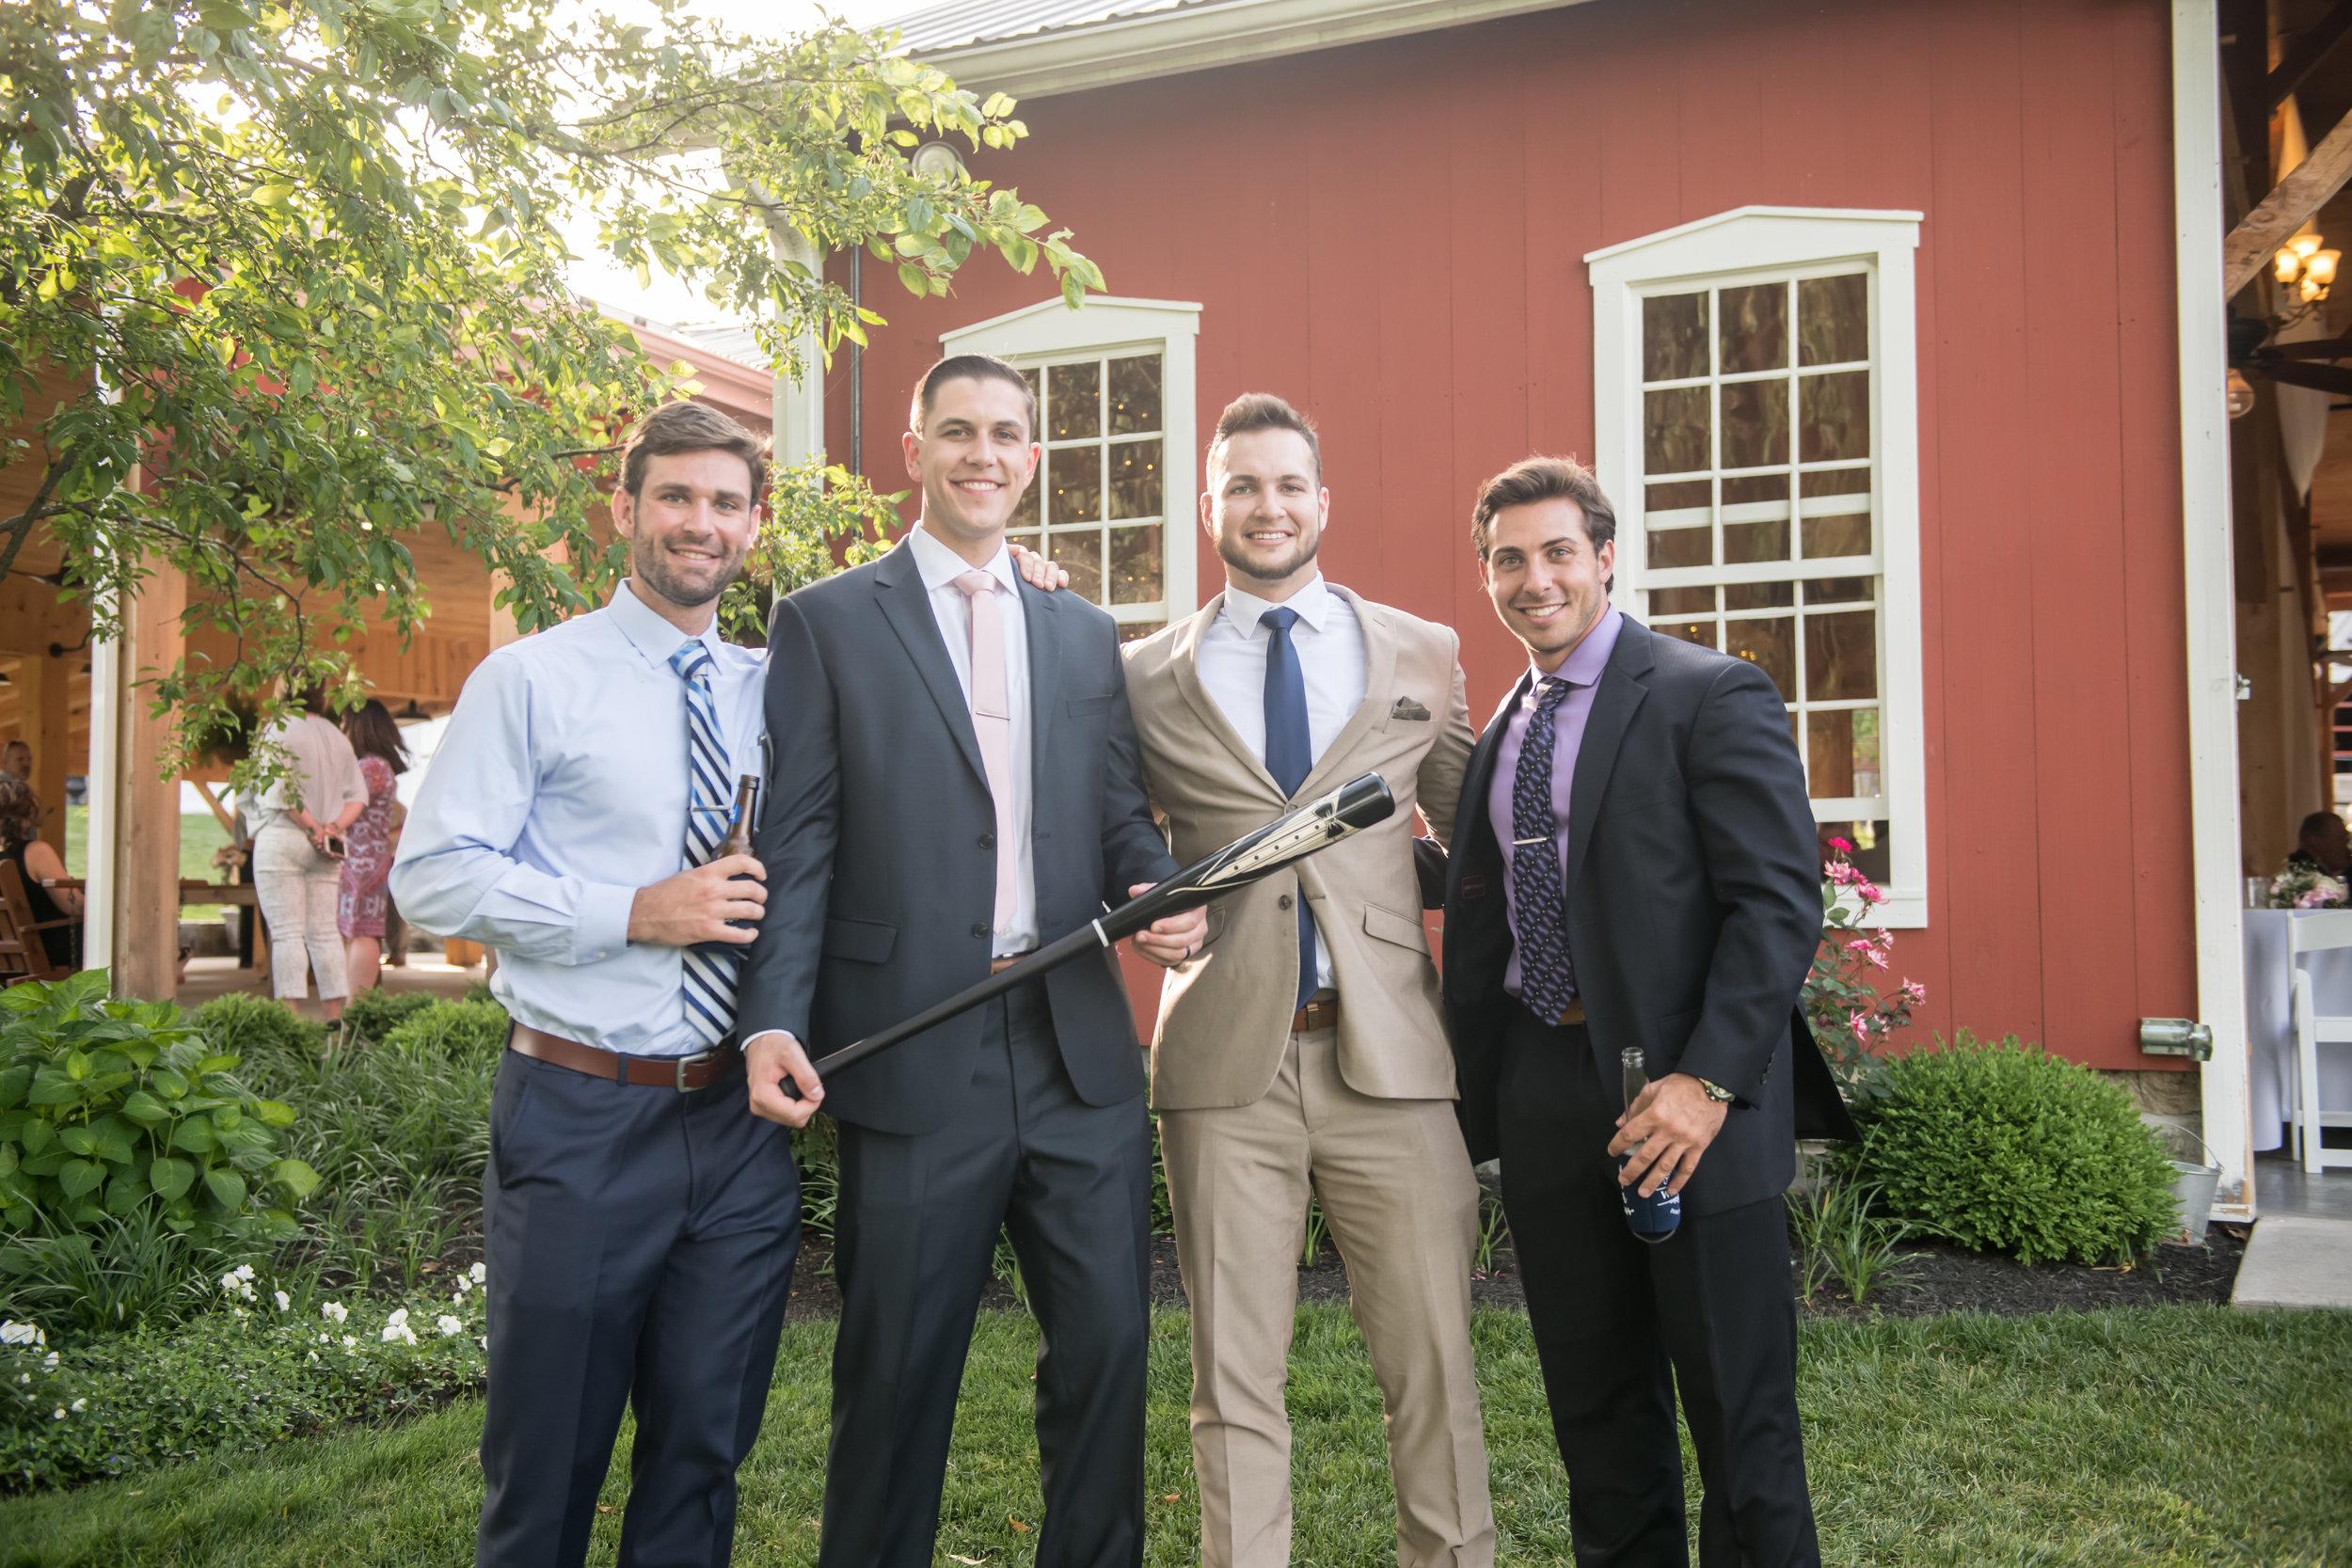 Welling Wedding-26.jpg